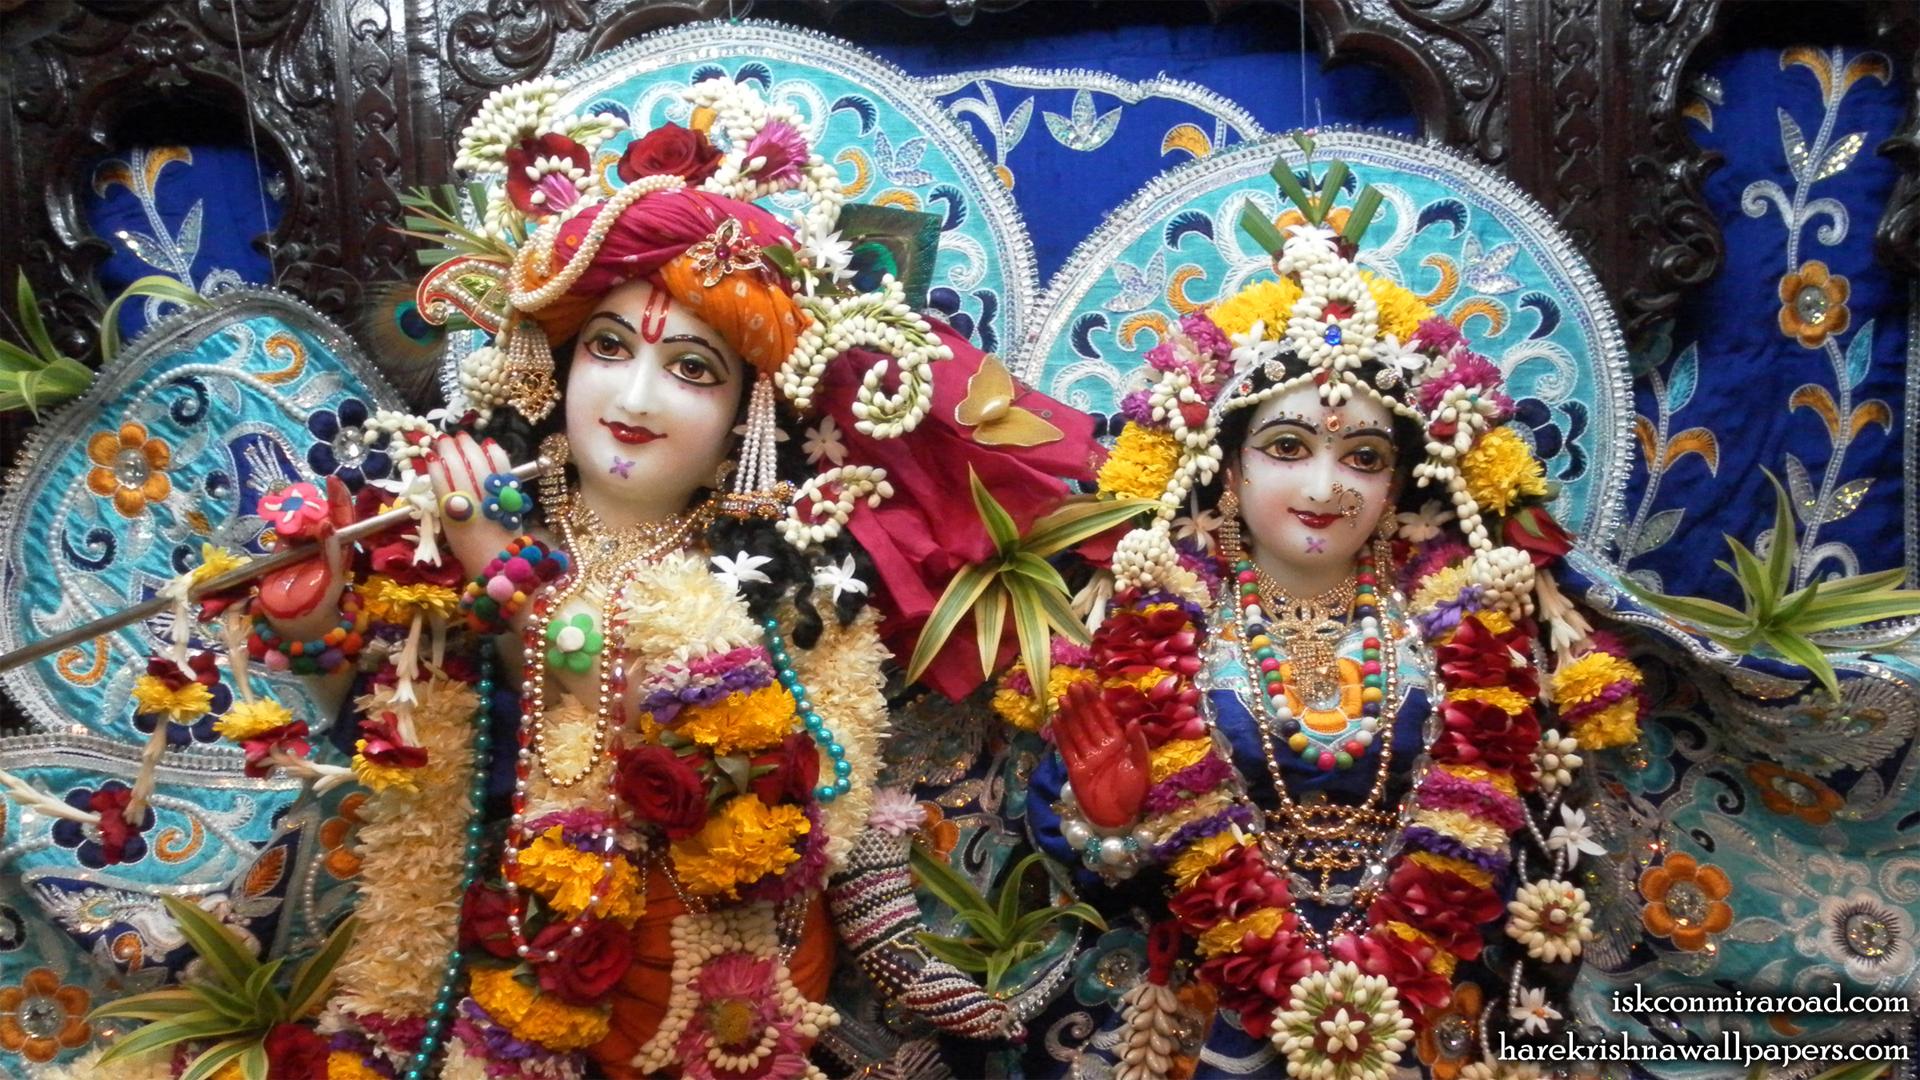 Sri Sri Radha Giridhari Close up Wallpaper (018) Size 1920x1080 Download